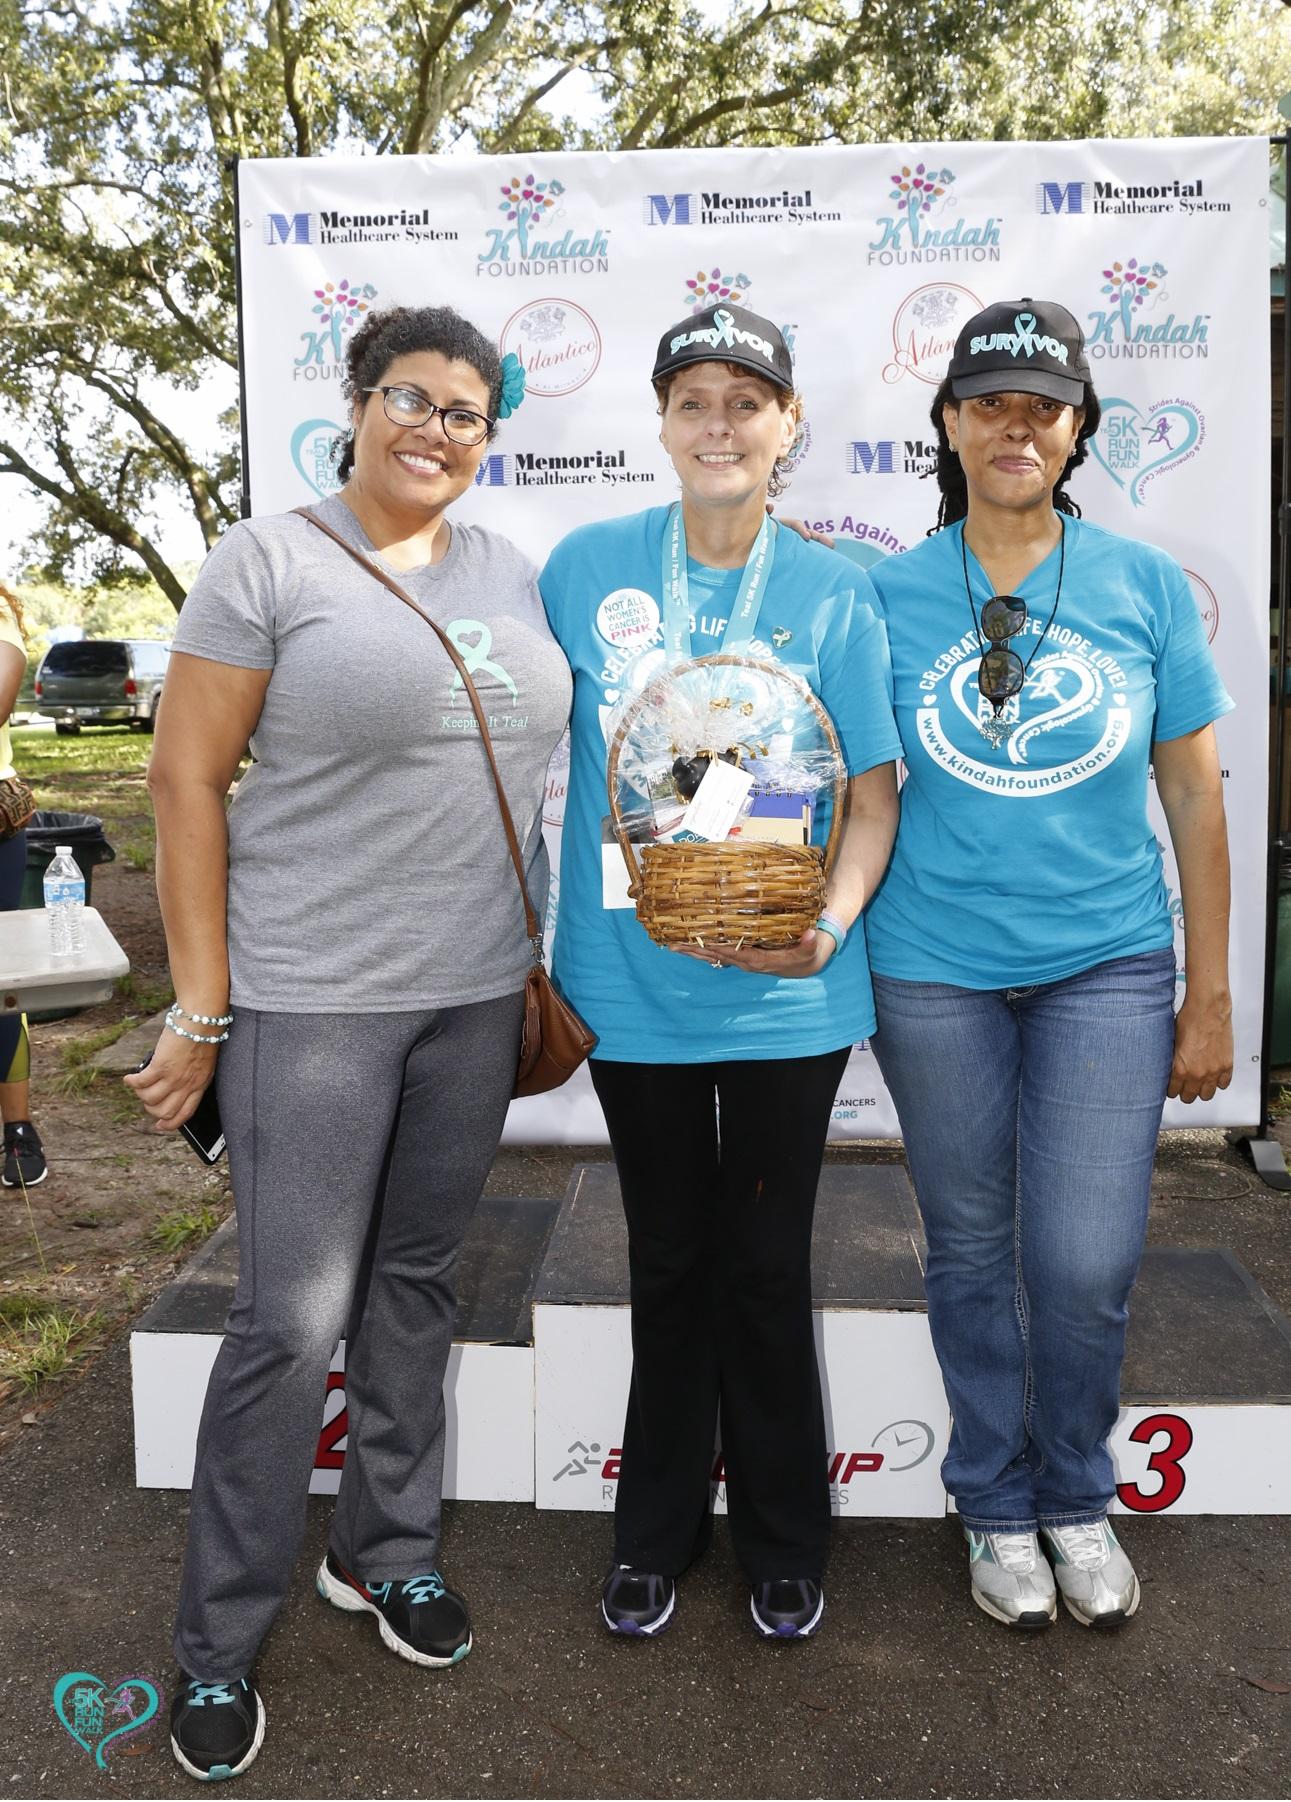 KF 0863 - Florida Teal 5K Run/ Fun Walk 2016